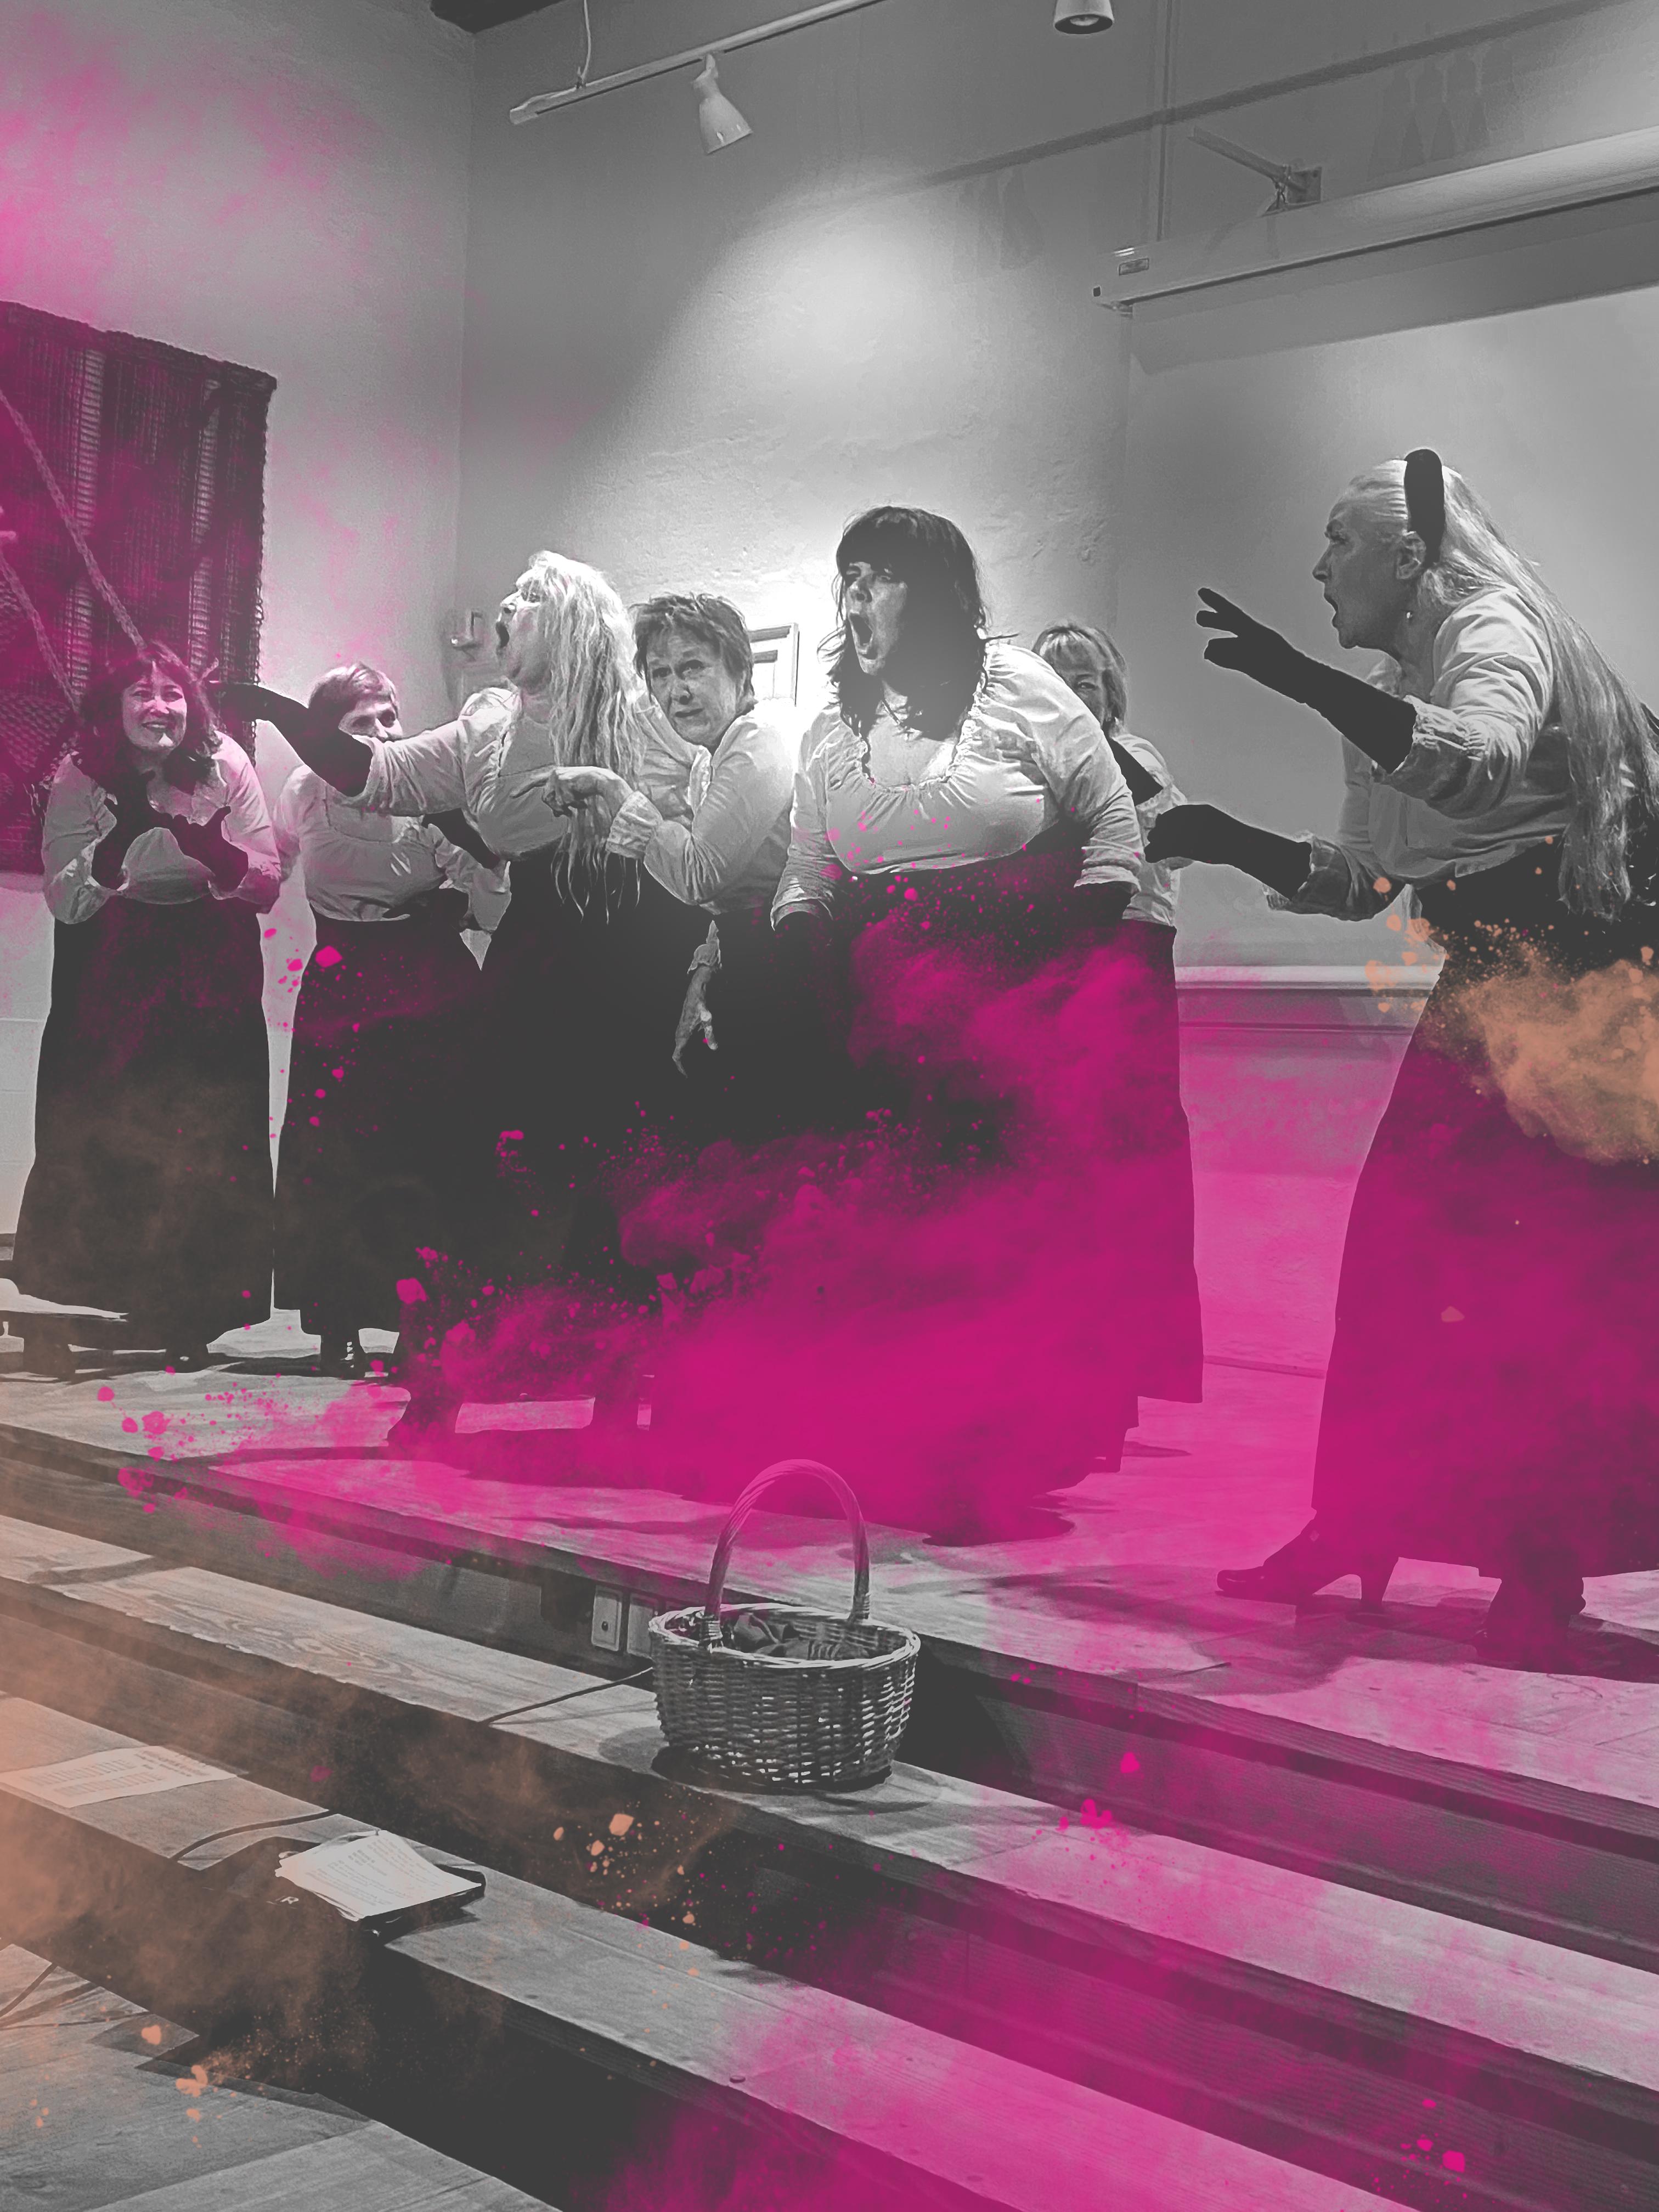 Opera i Provinsen Heksekoret